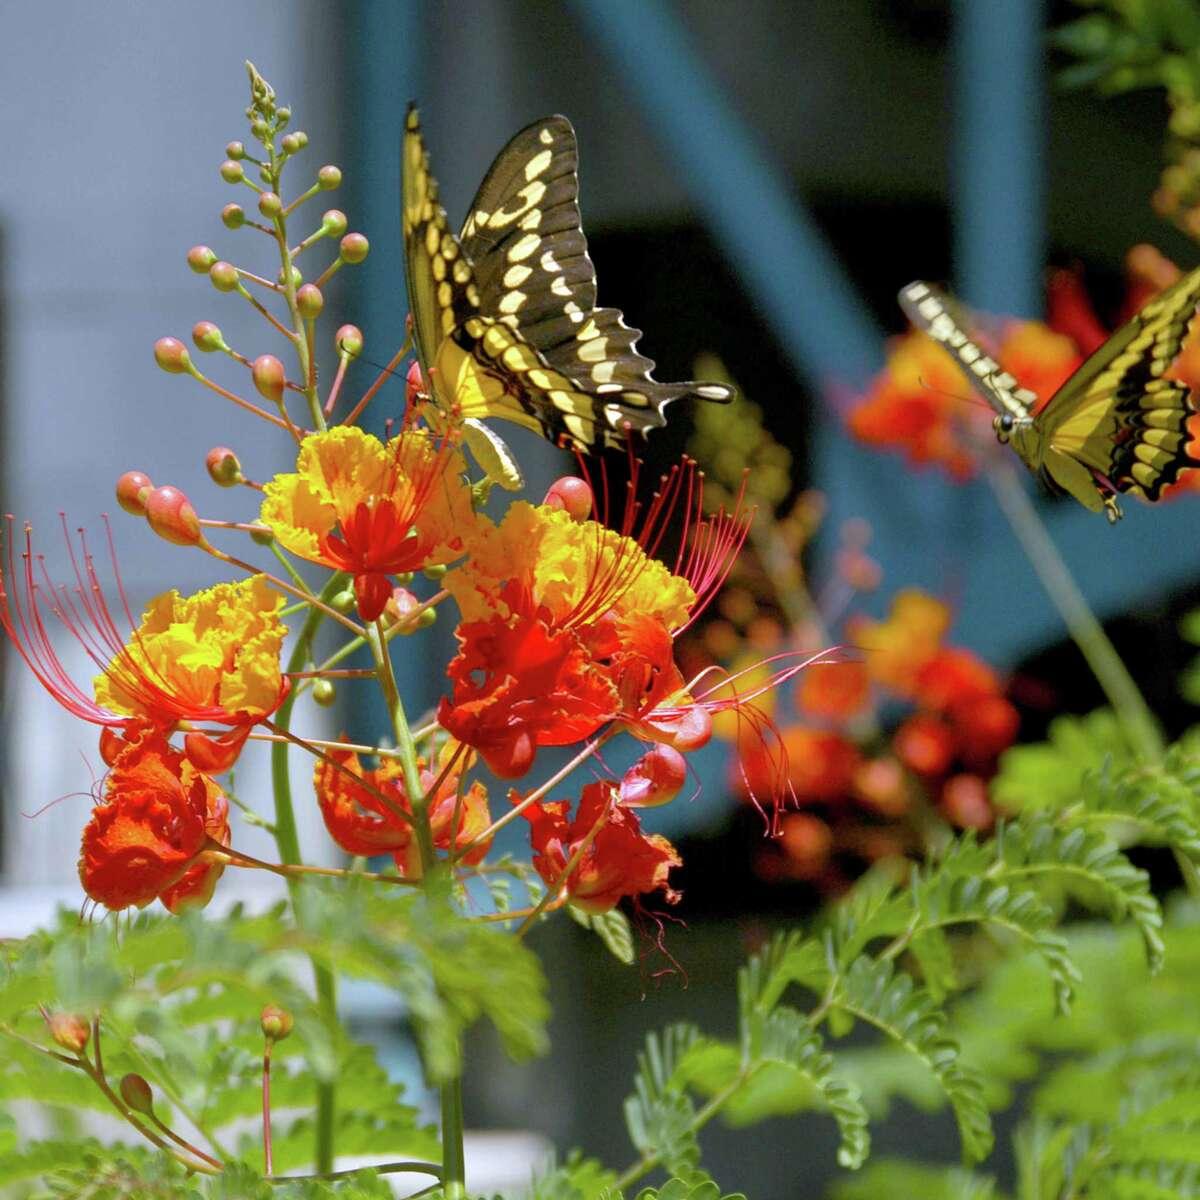 Pride of Barbados attracts butterflies.